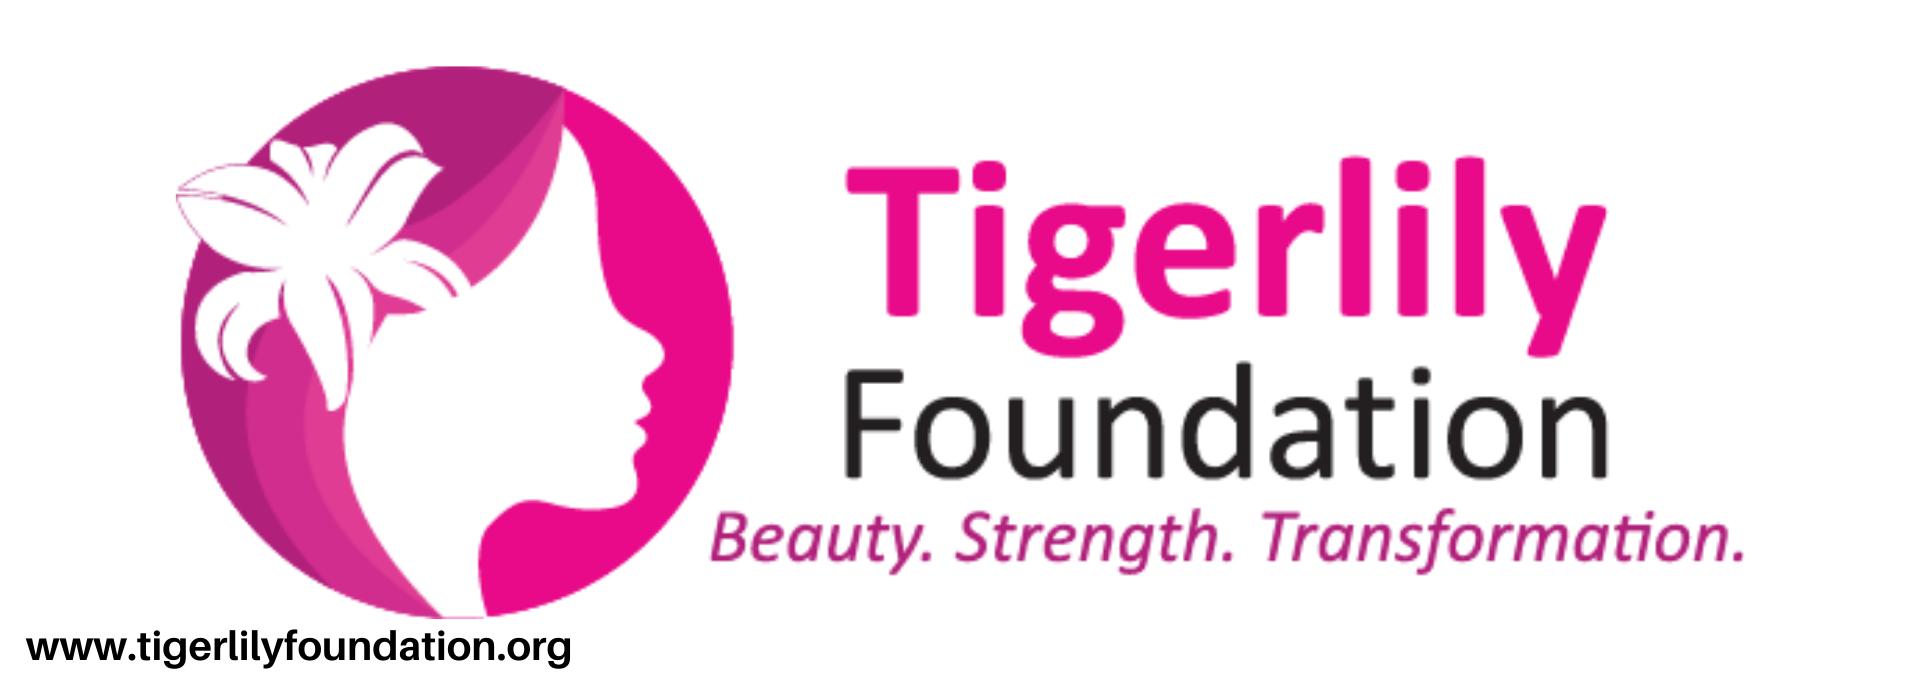 Tigerlily Foundation channel